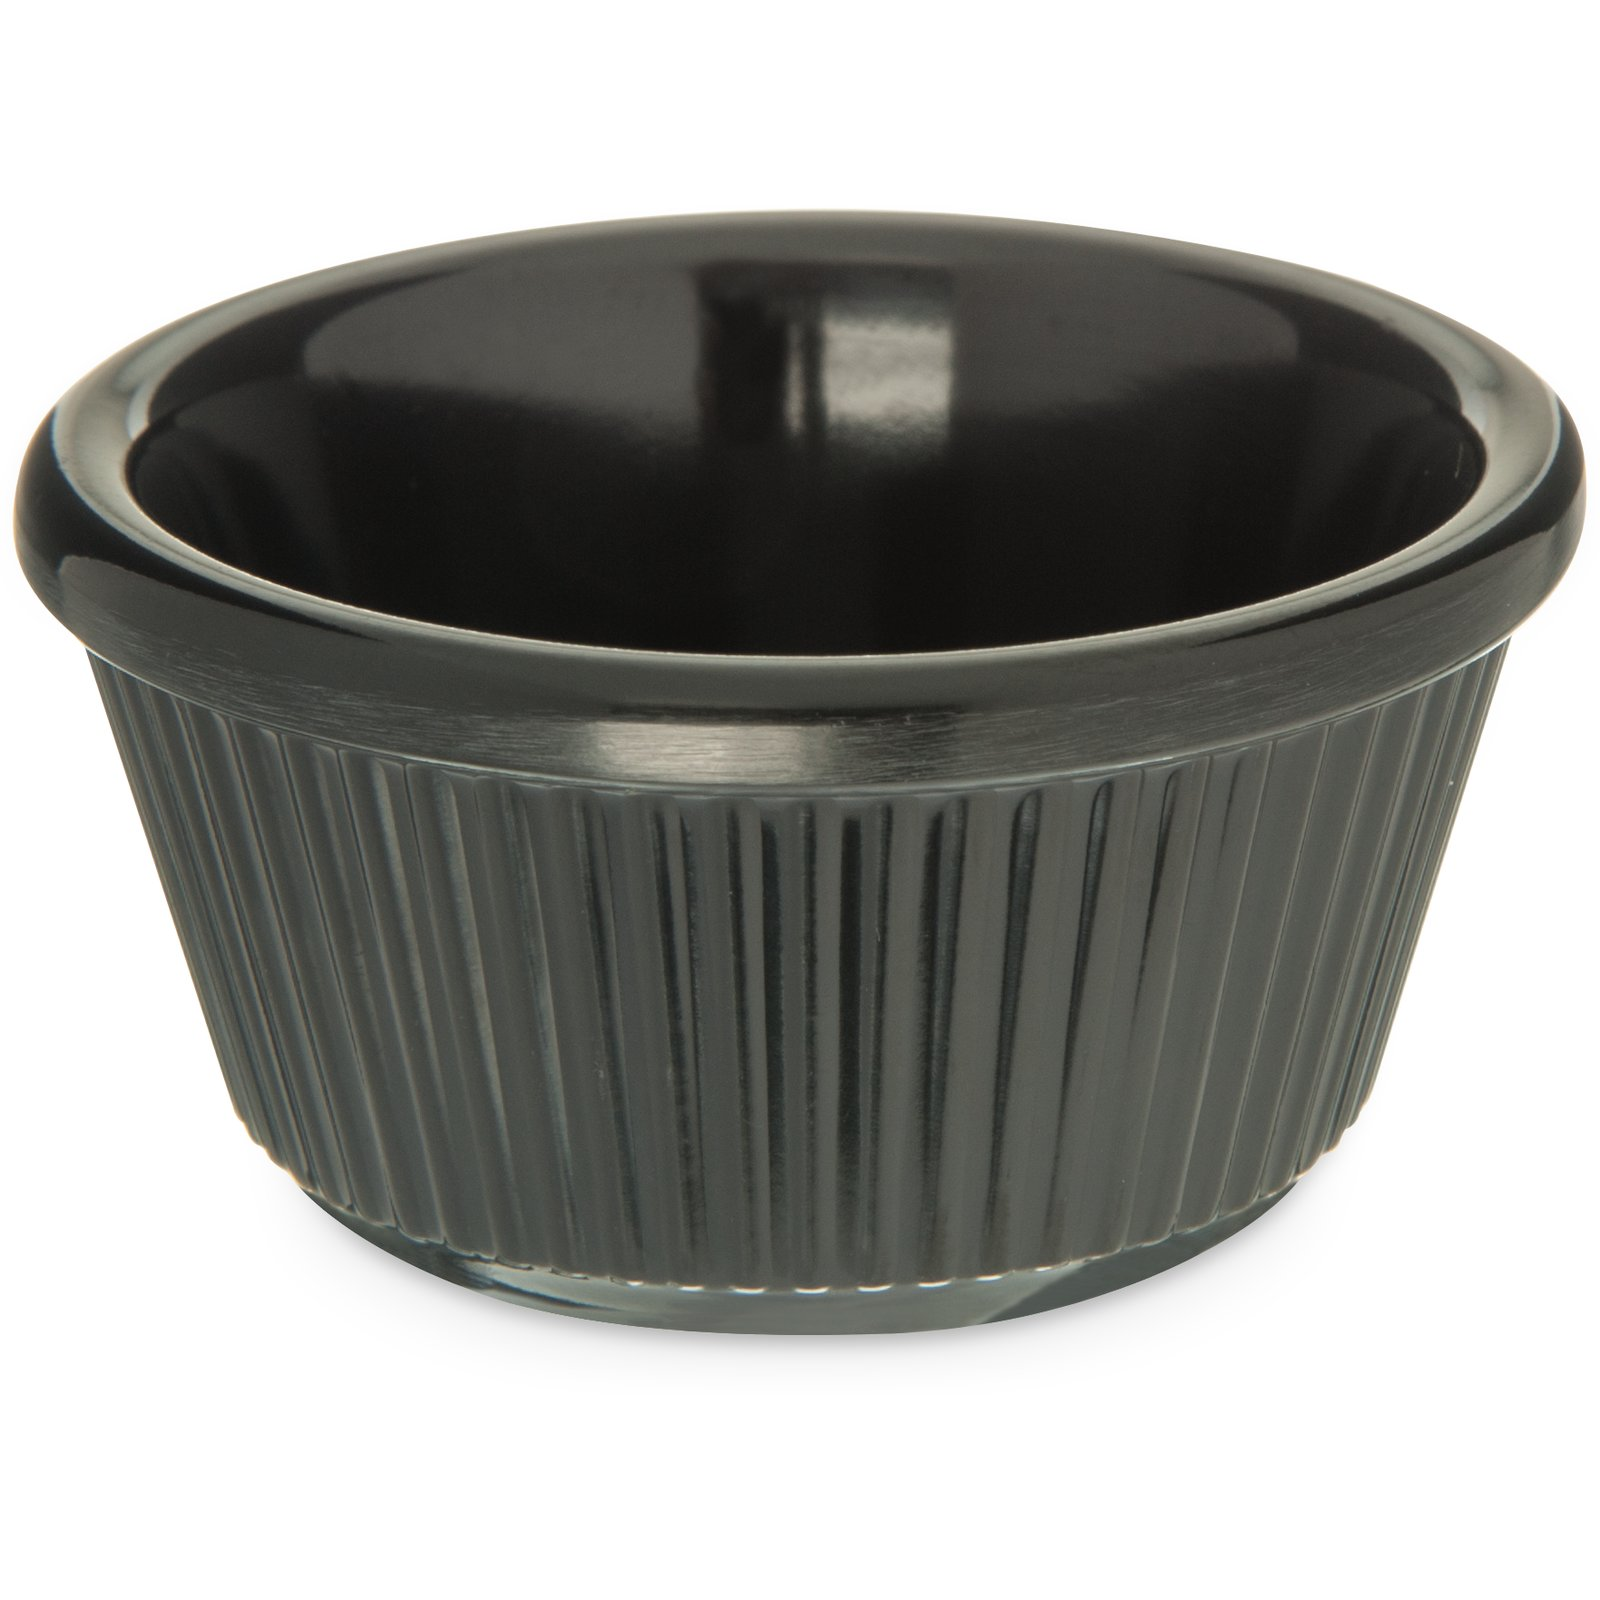 S28203 Melamine Fluted Ramekin 3 Oz Black Carlisle Foodservice Products